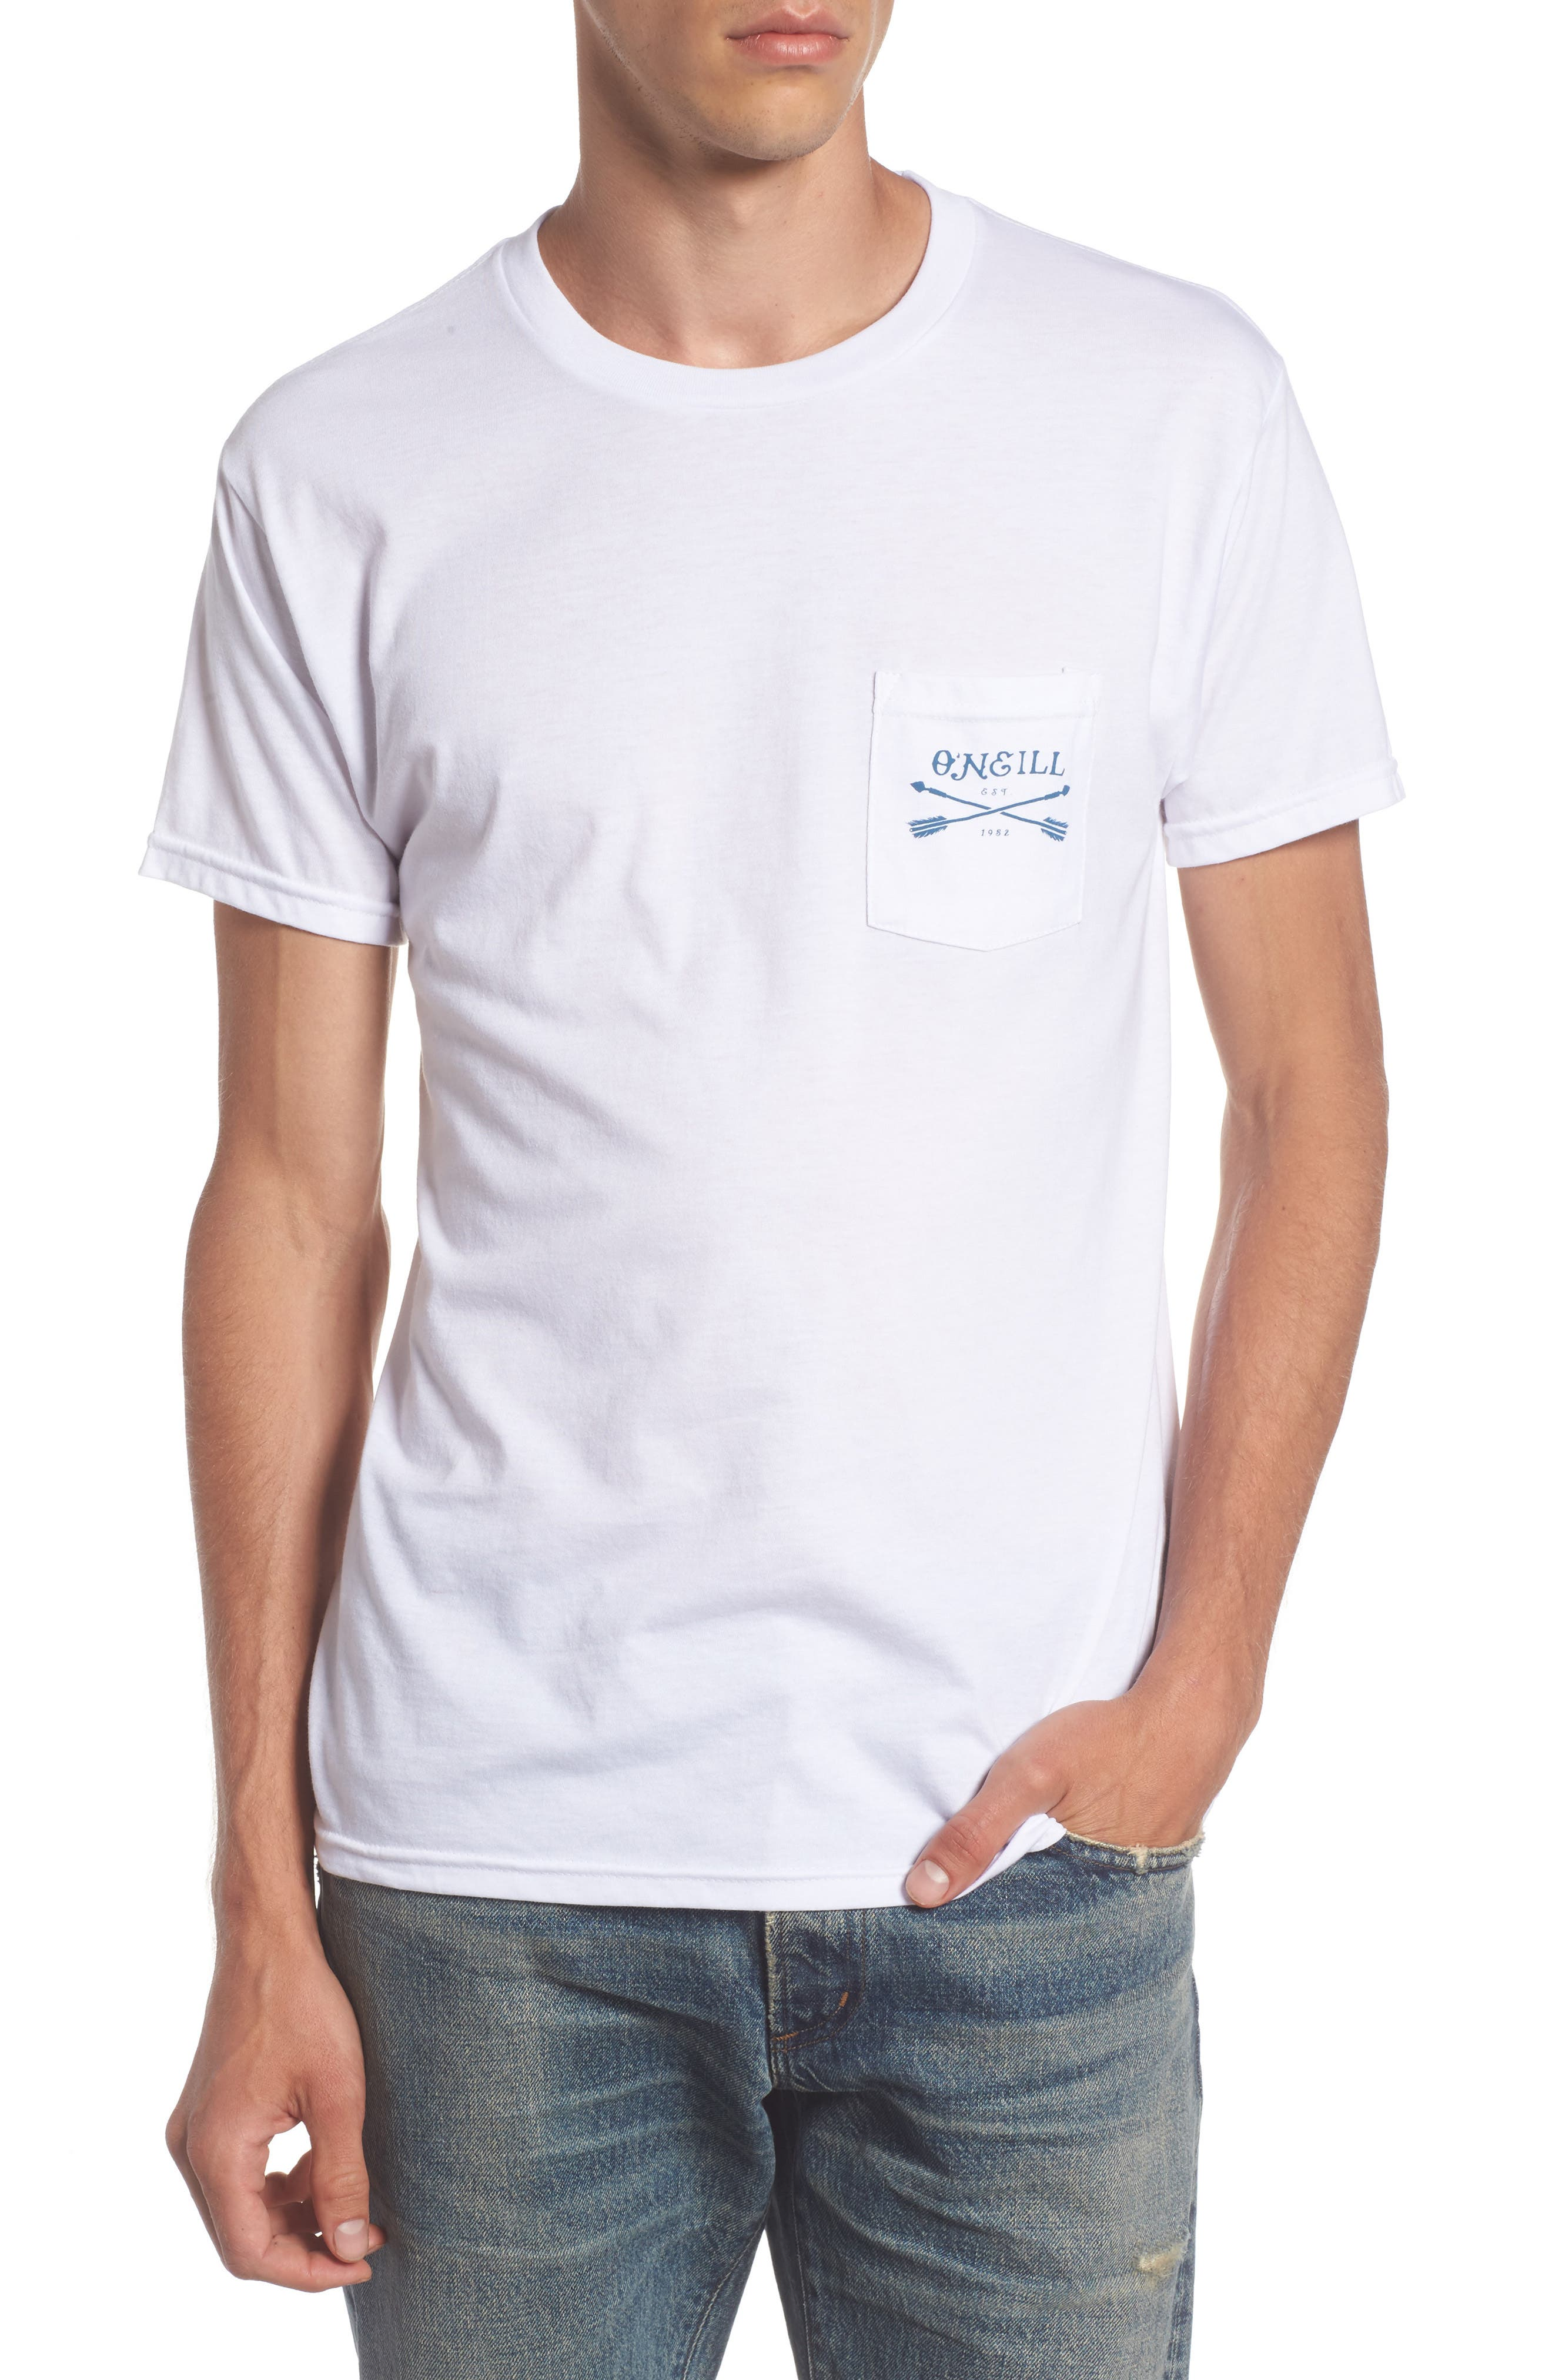 O'Neill Arrows Pocket T-Shirt